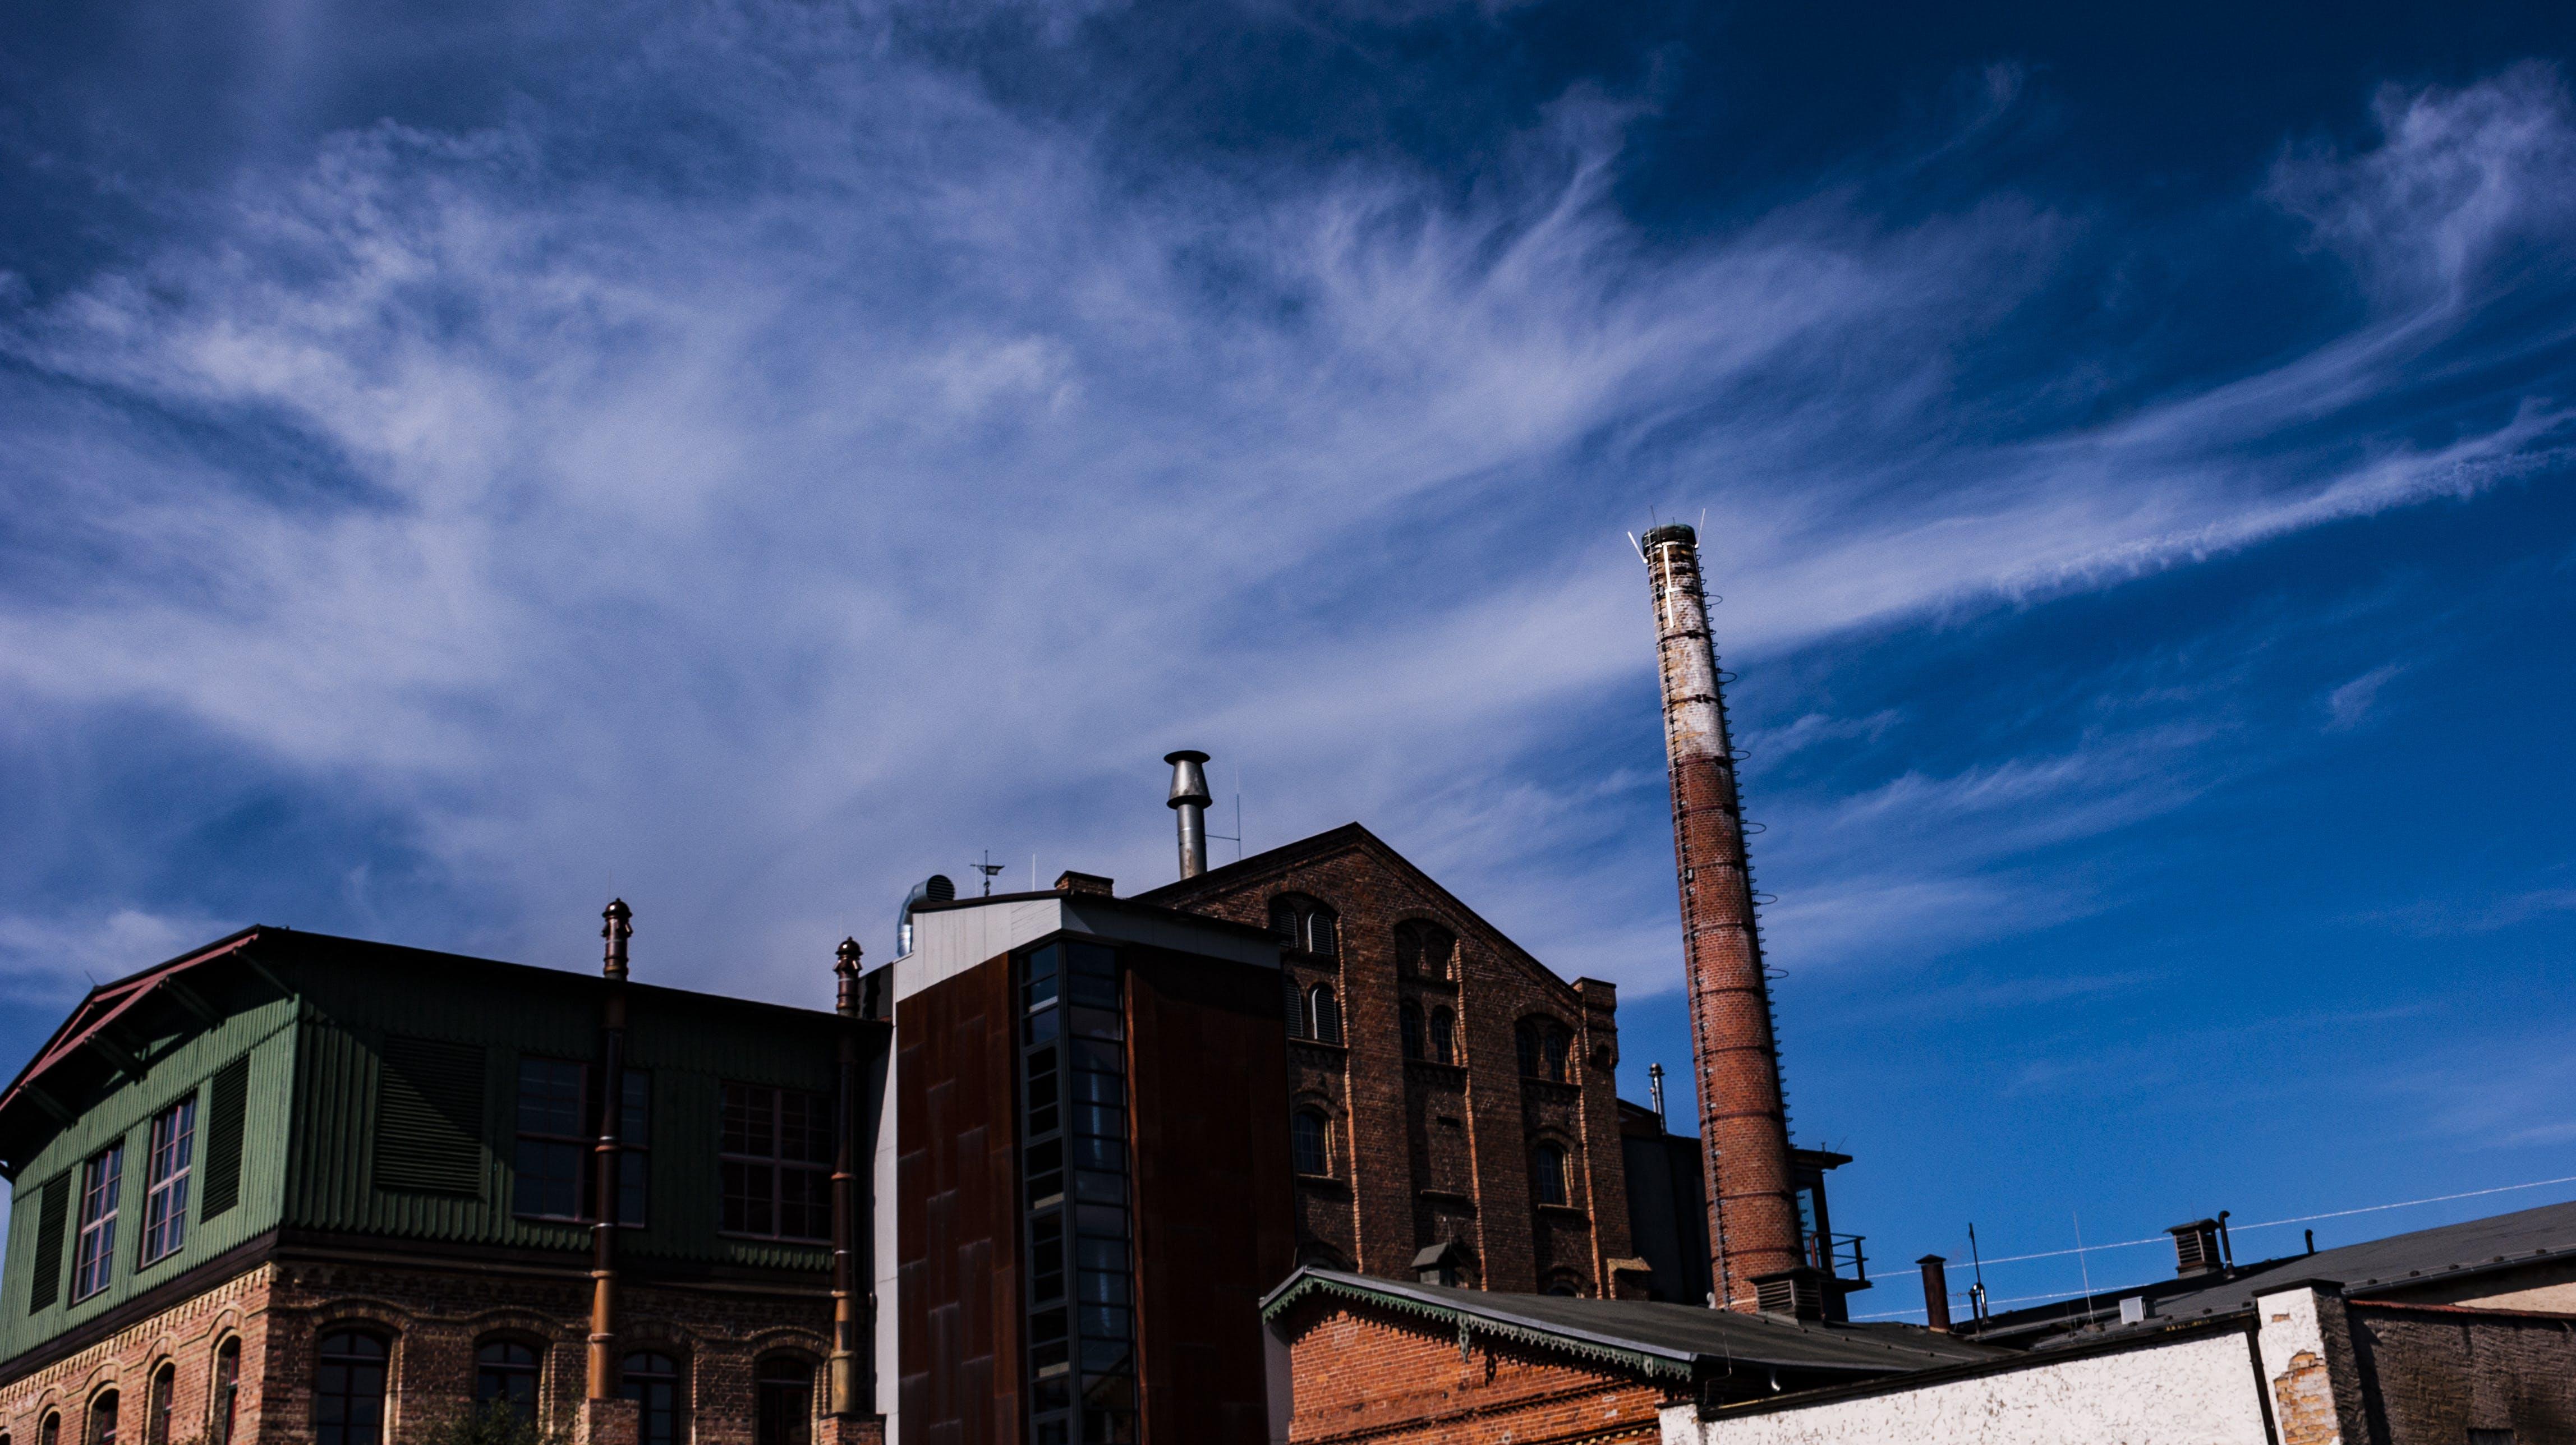 Kostenloses Stock Foto zu alte fabrik, blauer himmel, fabrik, produktion